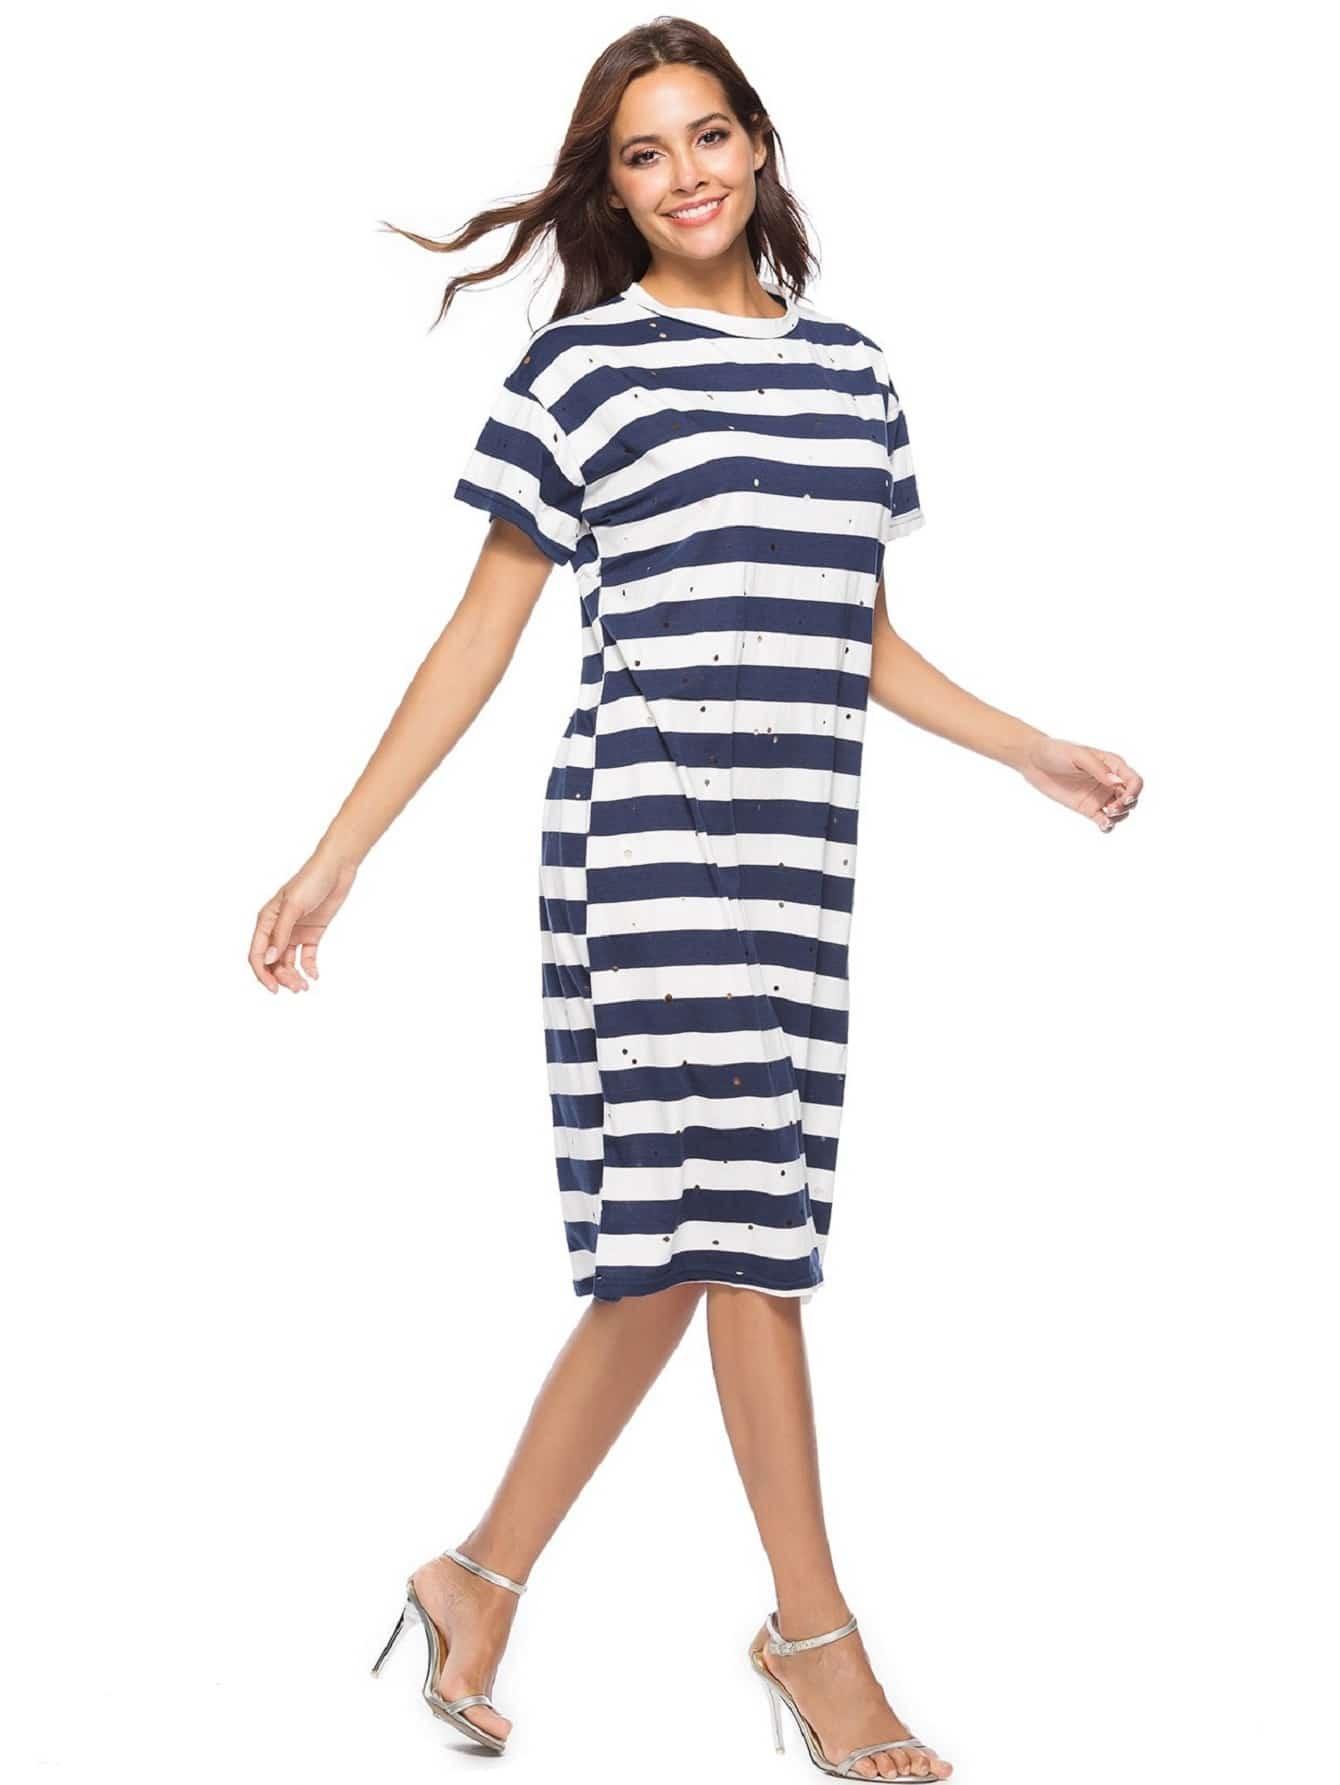 Wide Striped Ripped Dress wide striped ripped dress